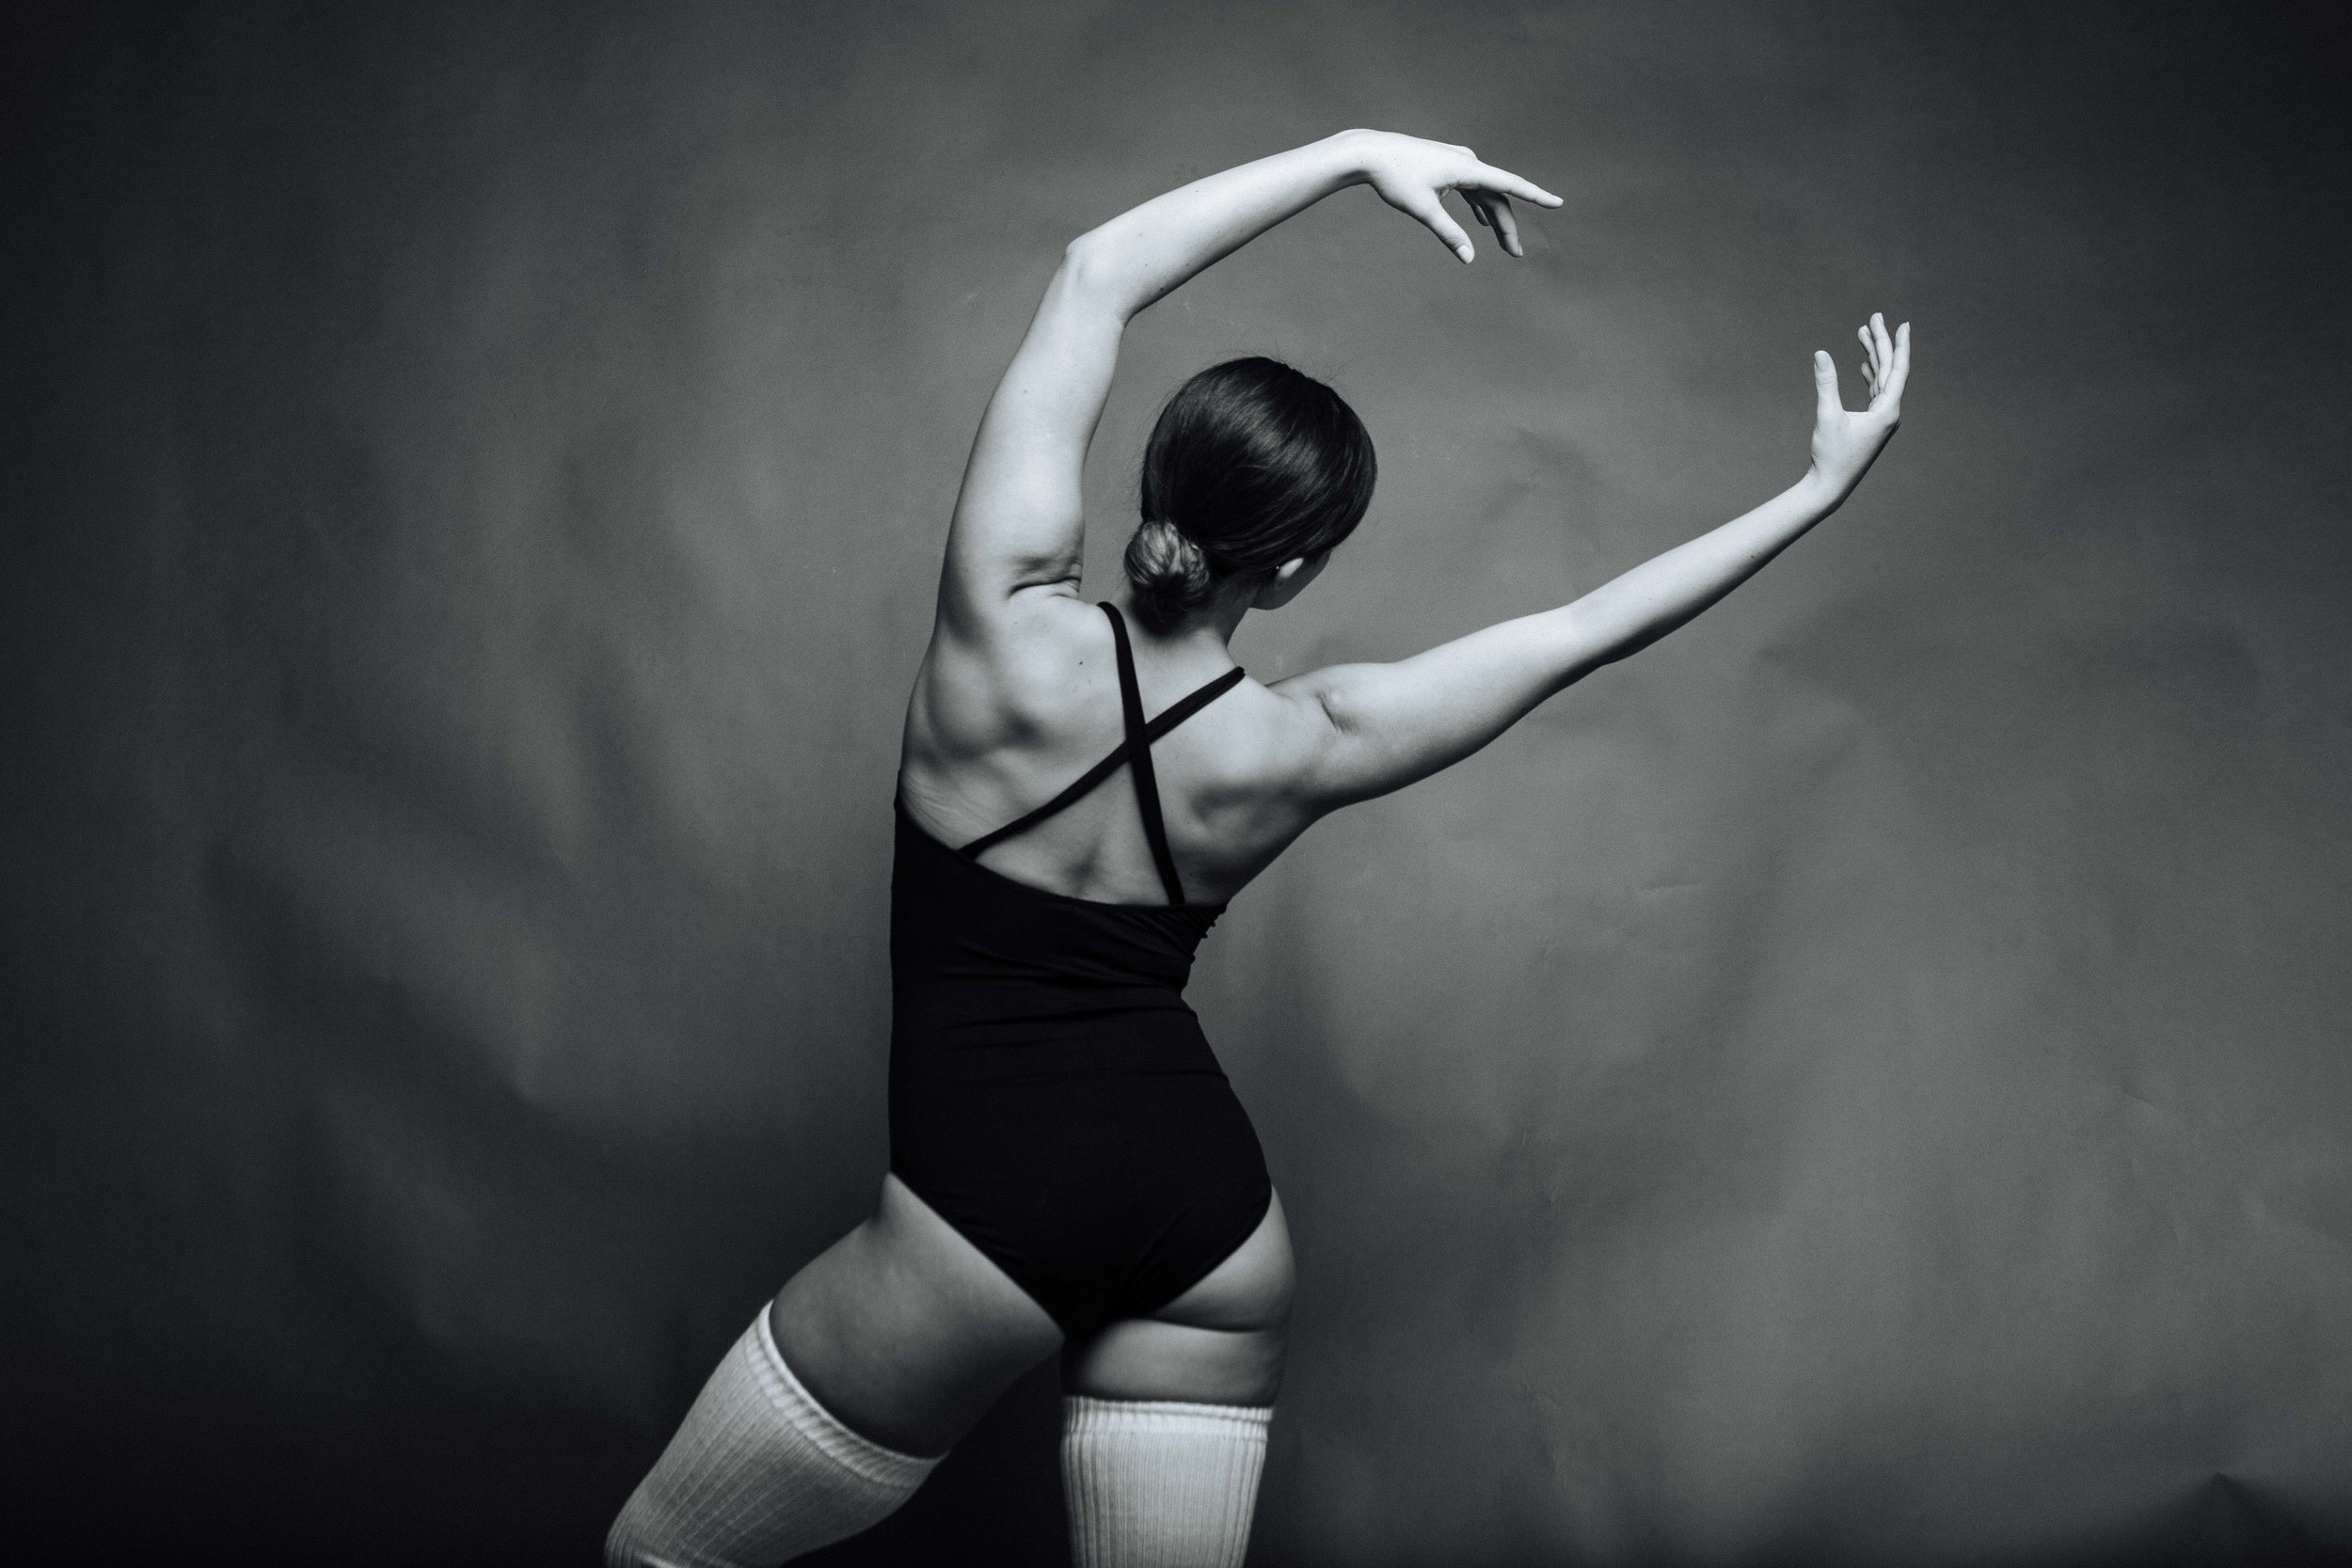 stephanie_dancer-1161.jpg